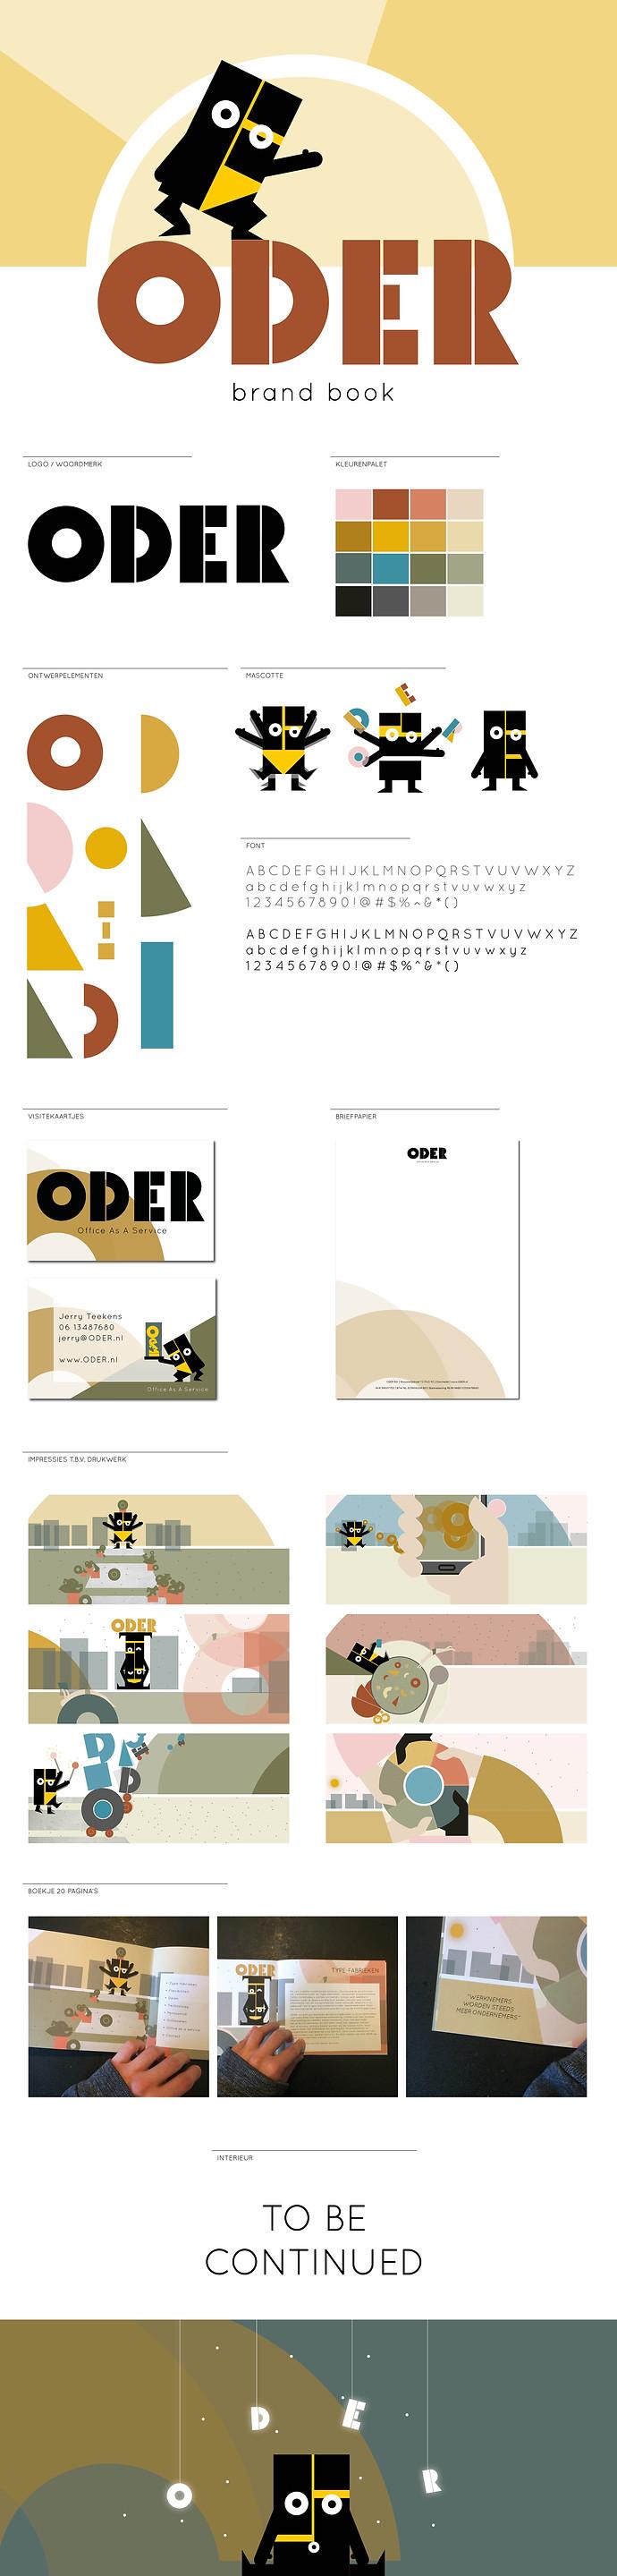 ODER-portfolio.jpg